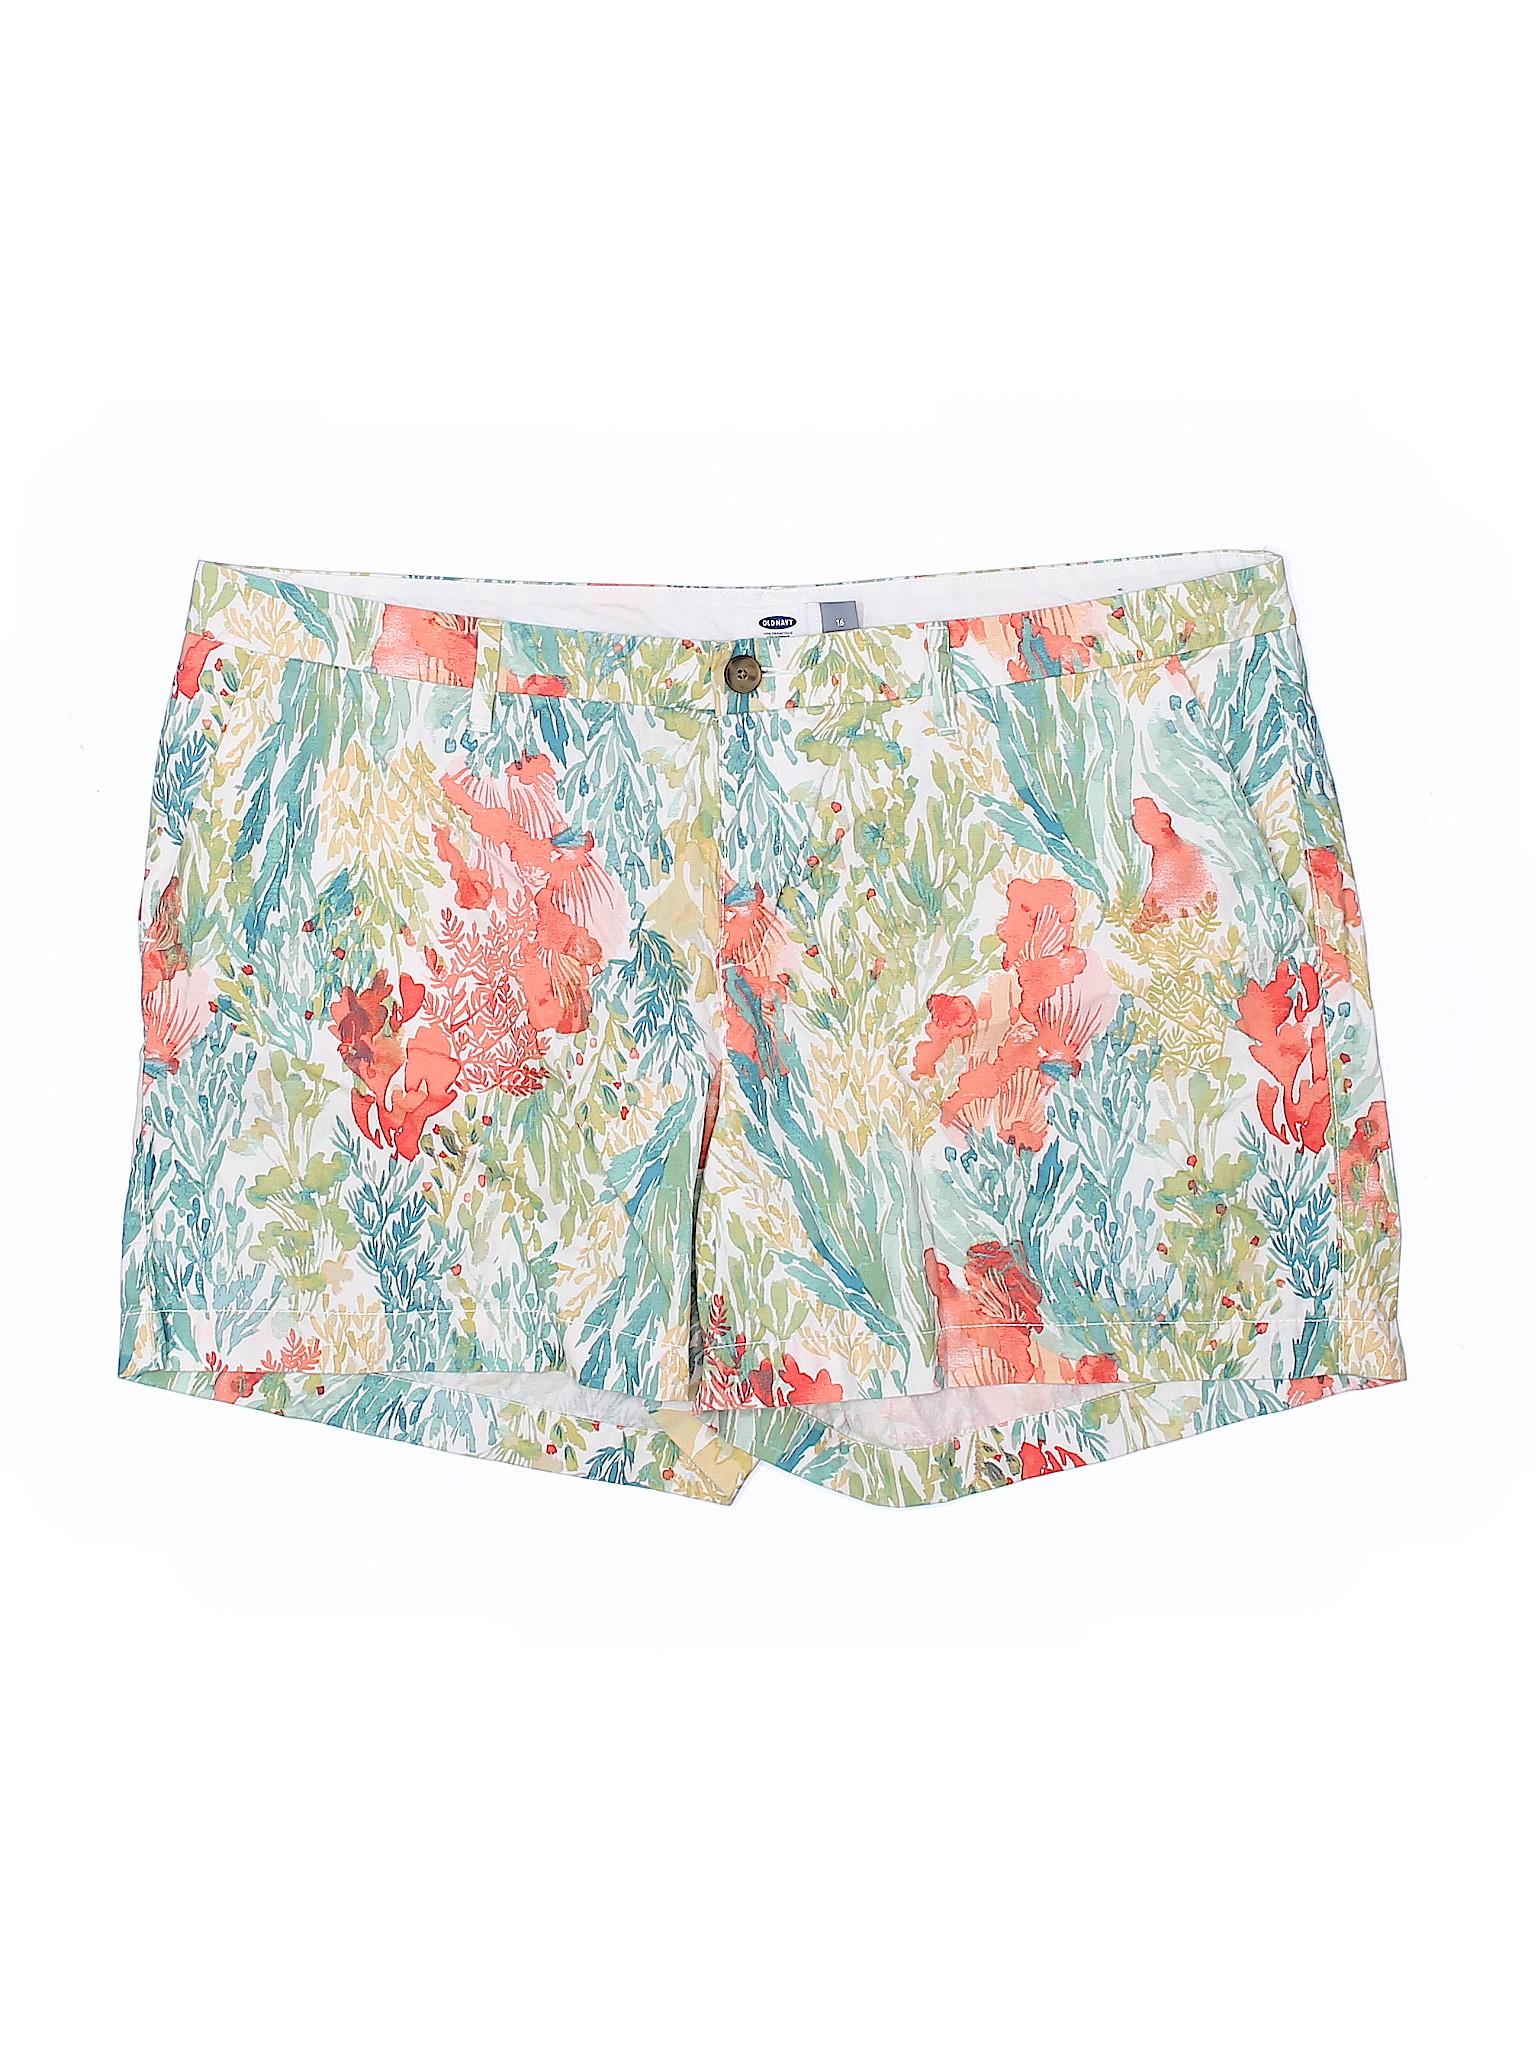 Khaki Old Navy Boutique Shorts leisure qP0Aw1